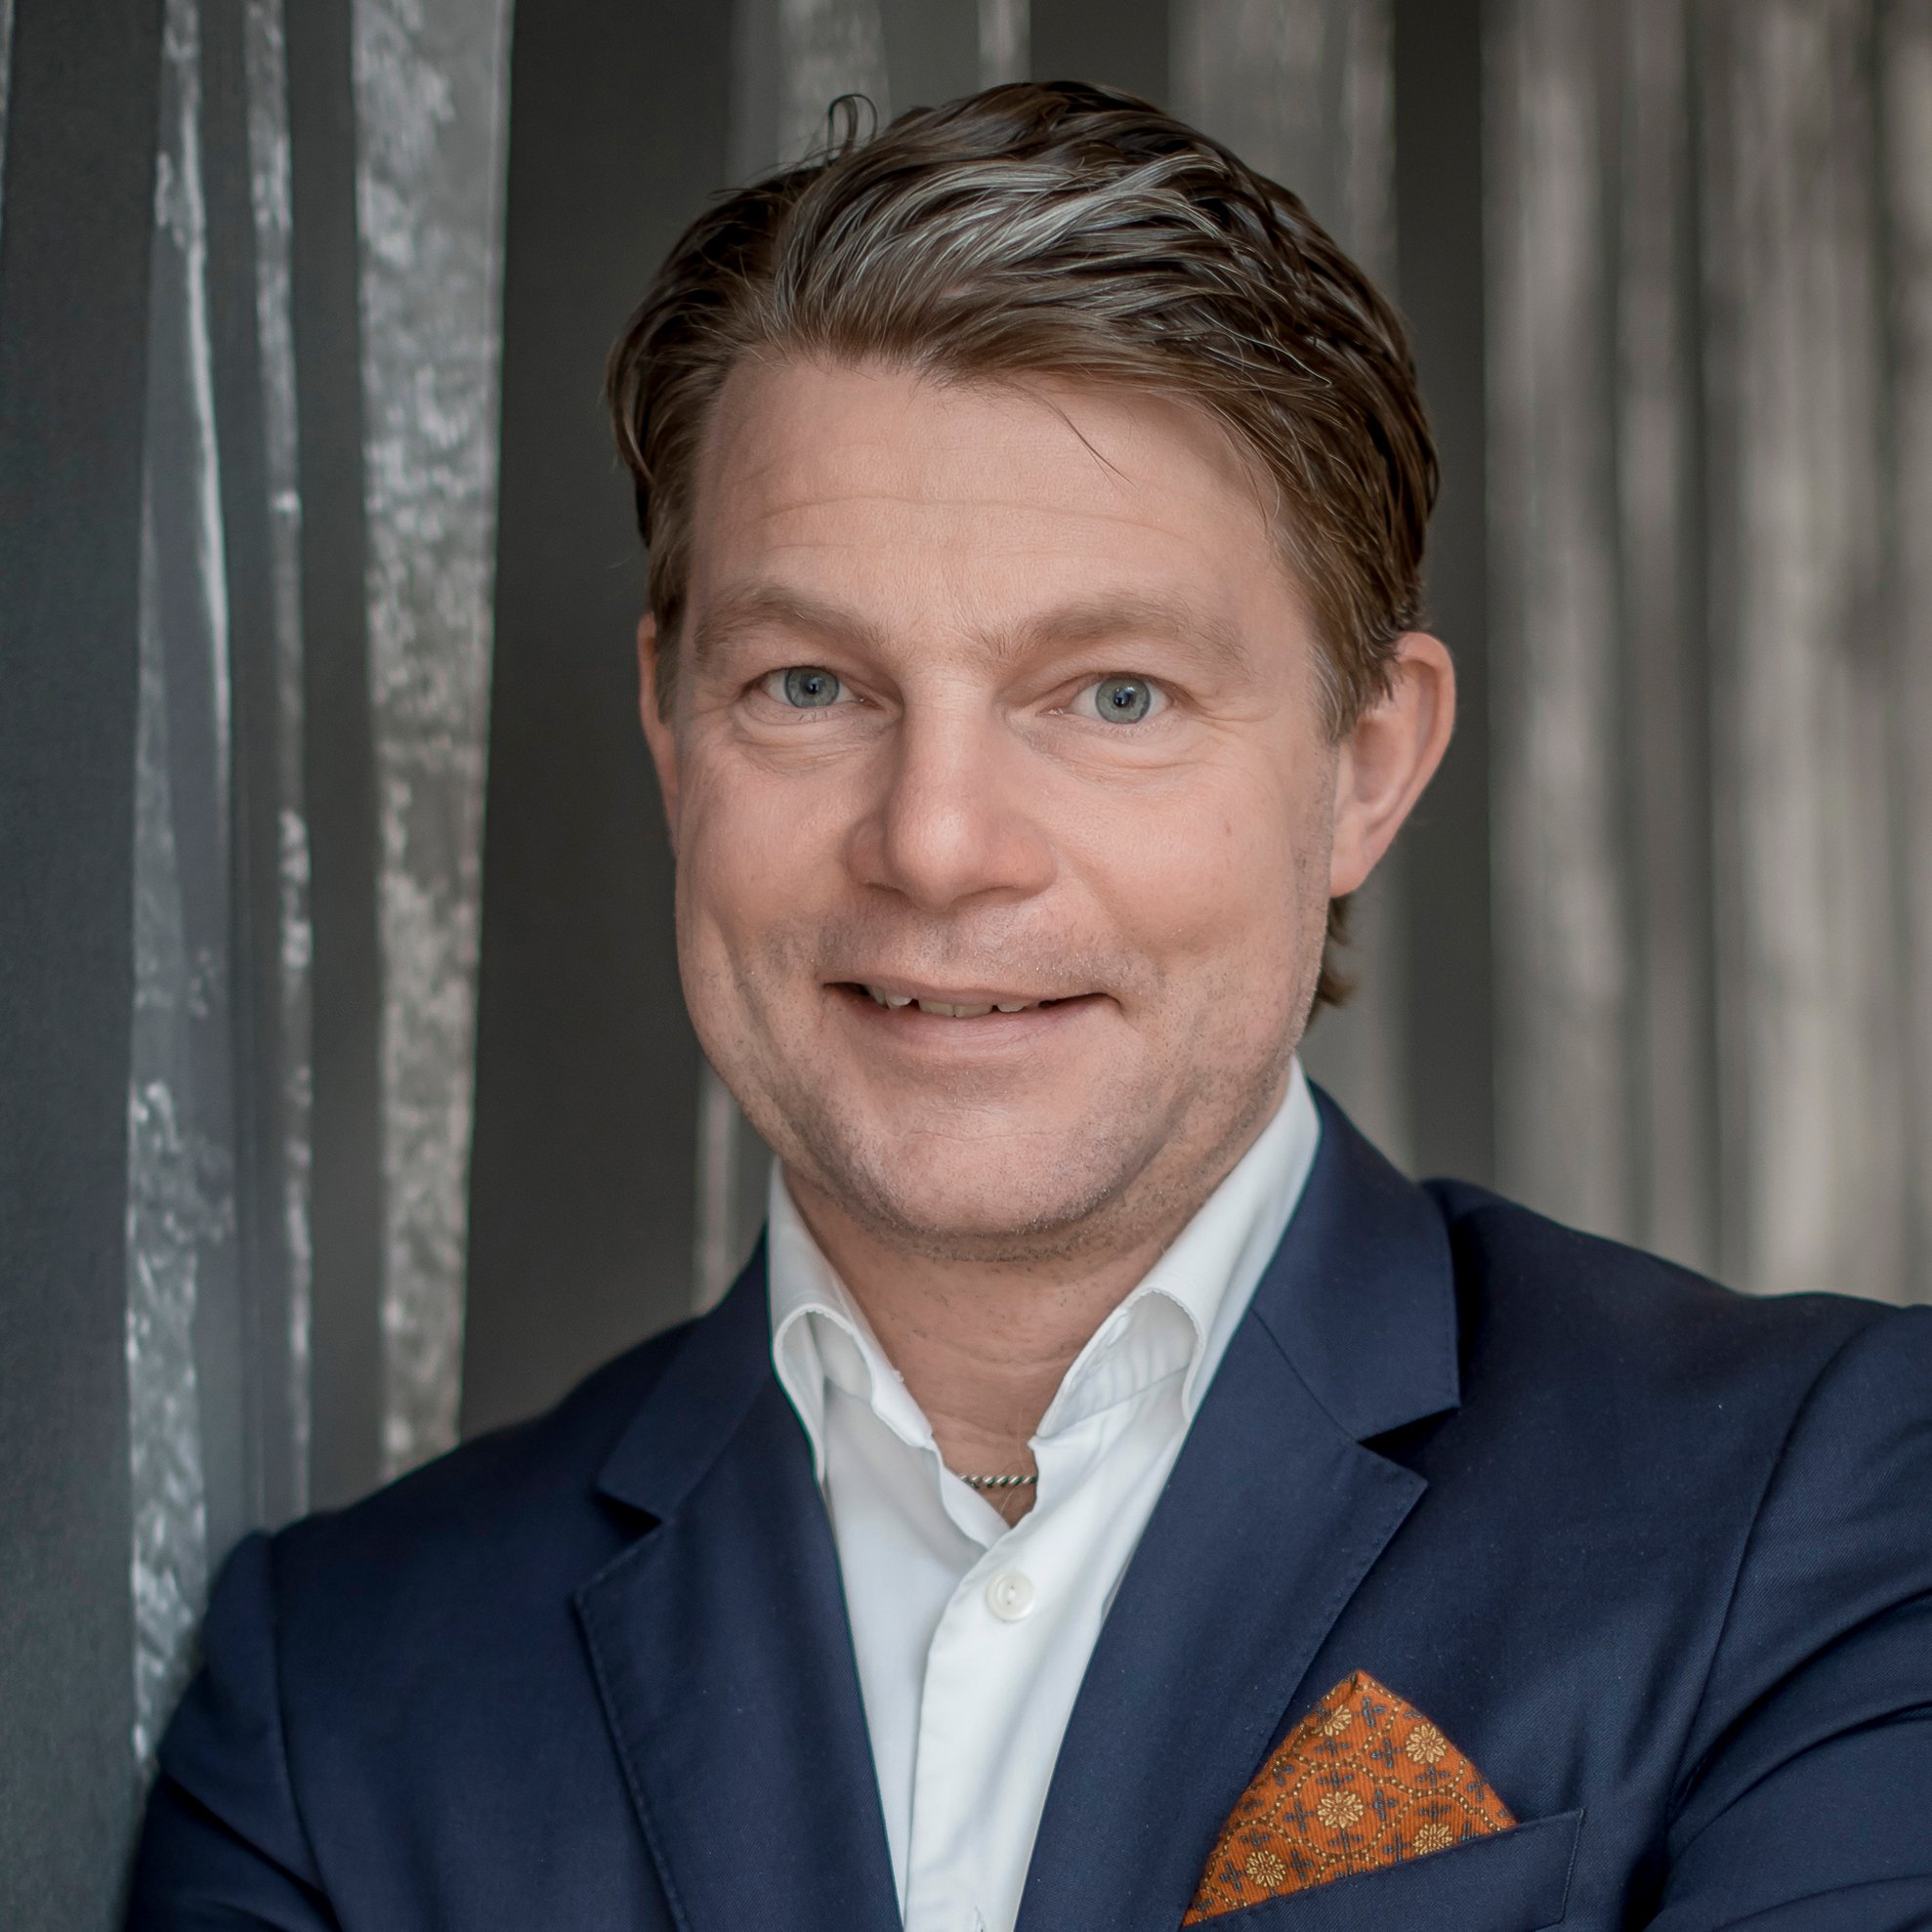 Peter Javestad